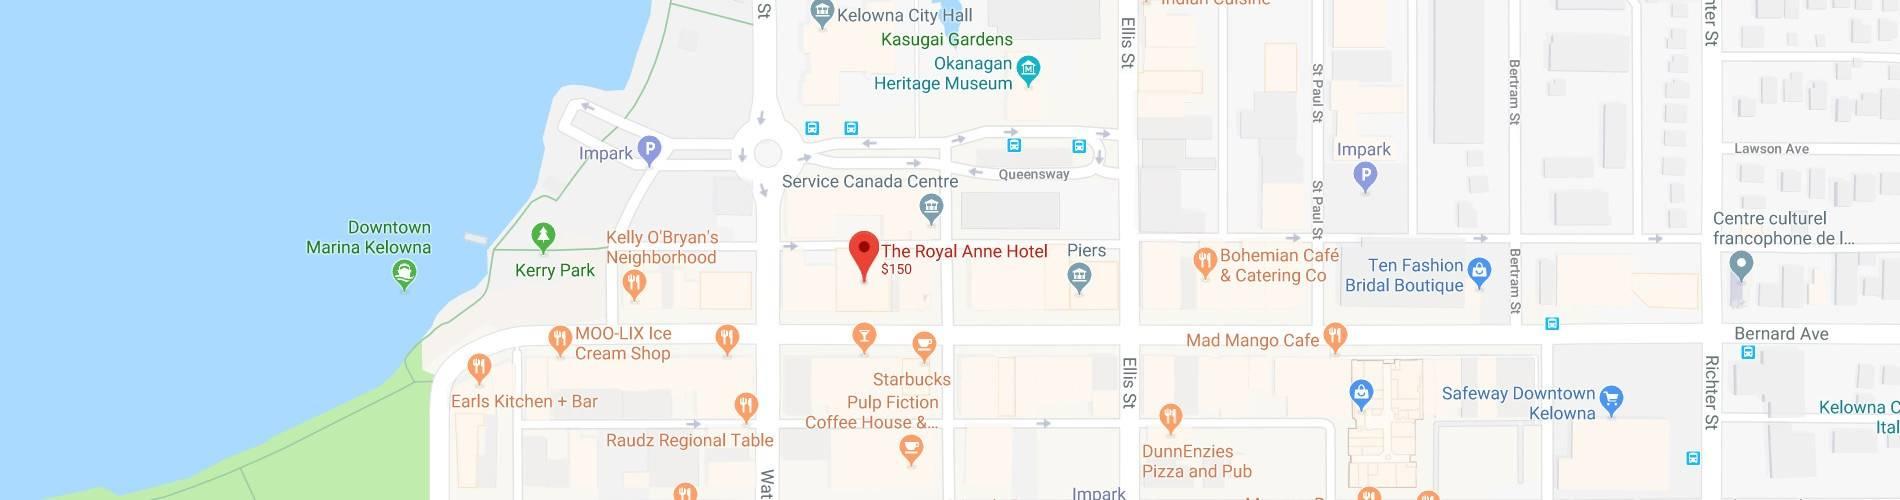 Calgary courses venue